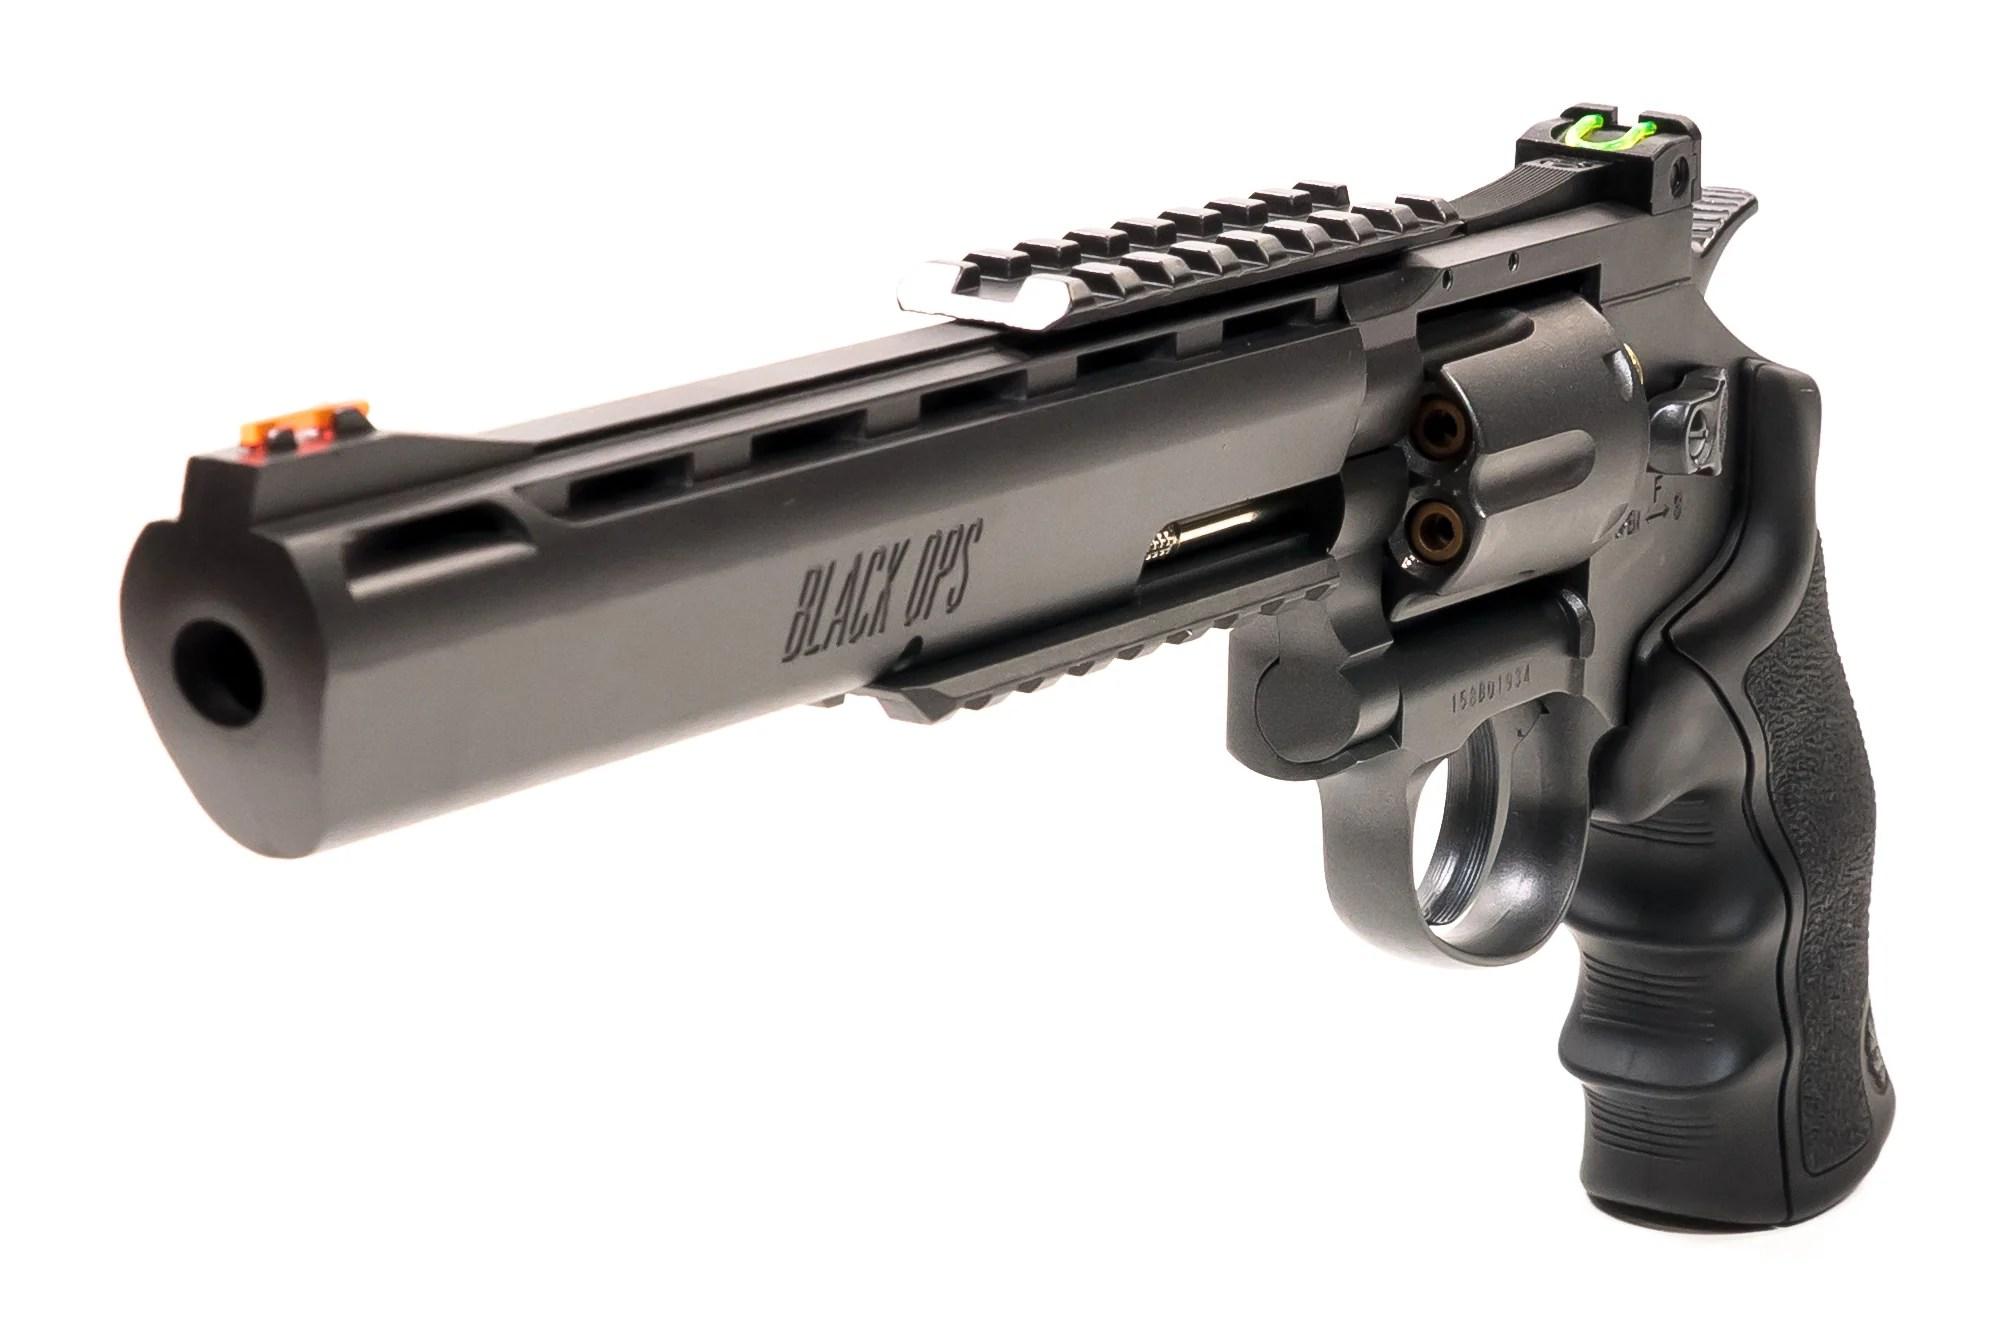 black ops exterminator 8 inch revolver gun metal finish full metal co2 bb pistol shoot 177 bbs pellet cartridges available [ 1991 x 1327 Pixel ]